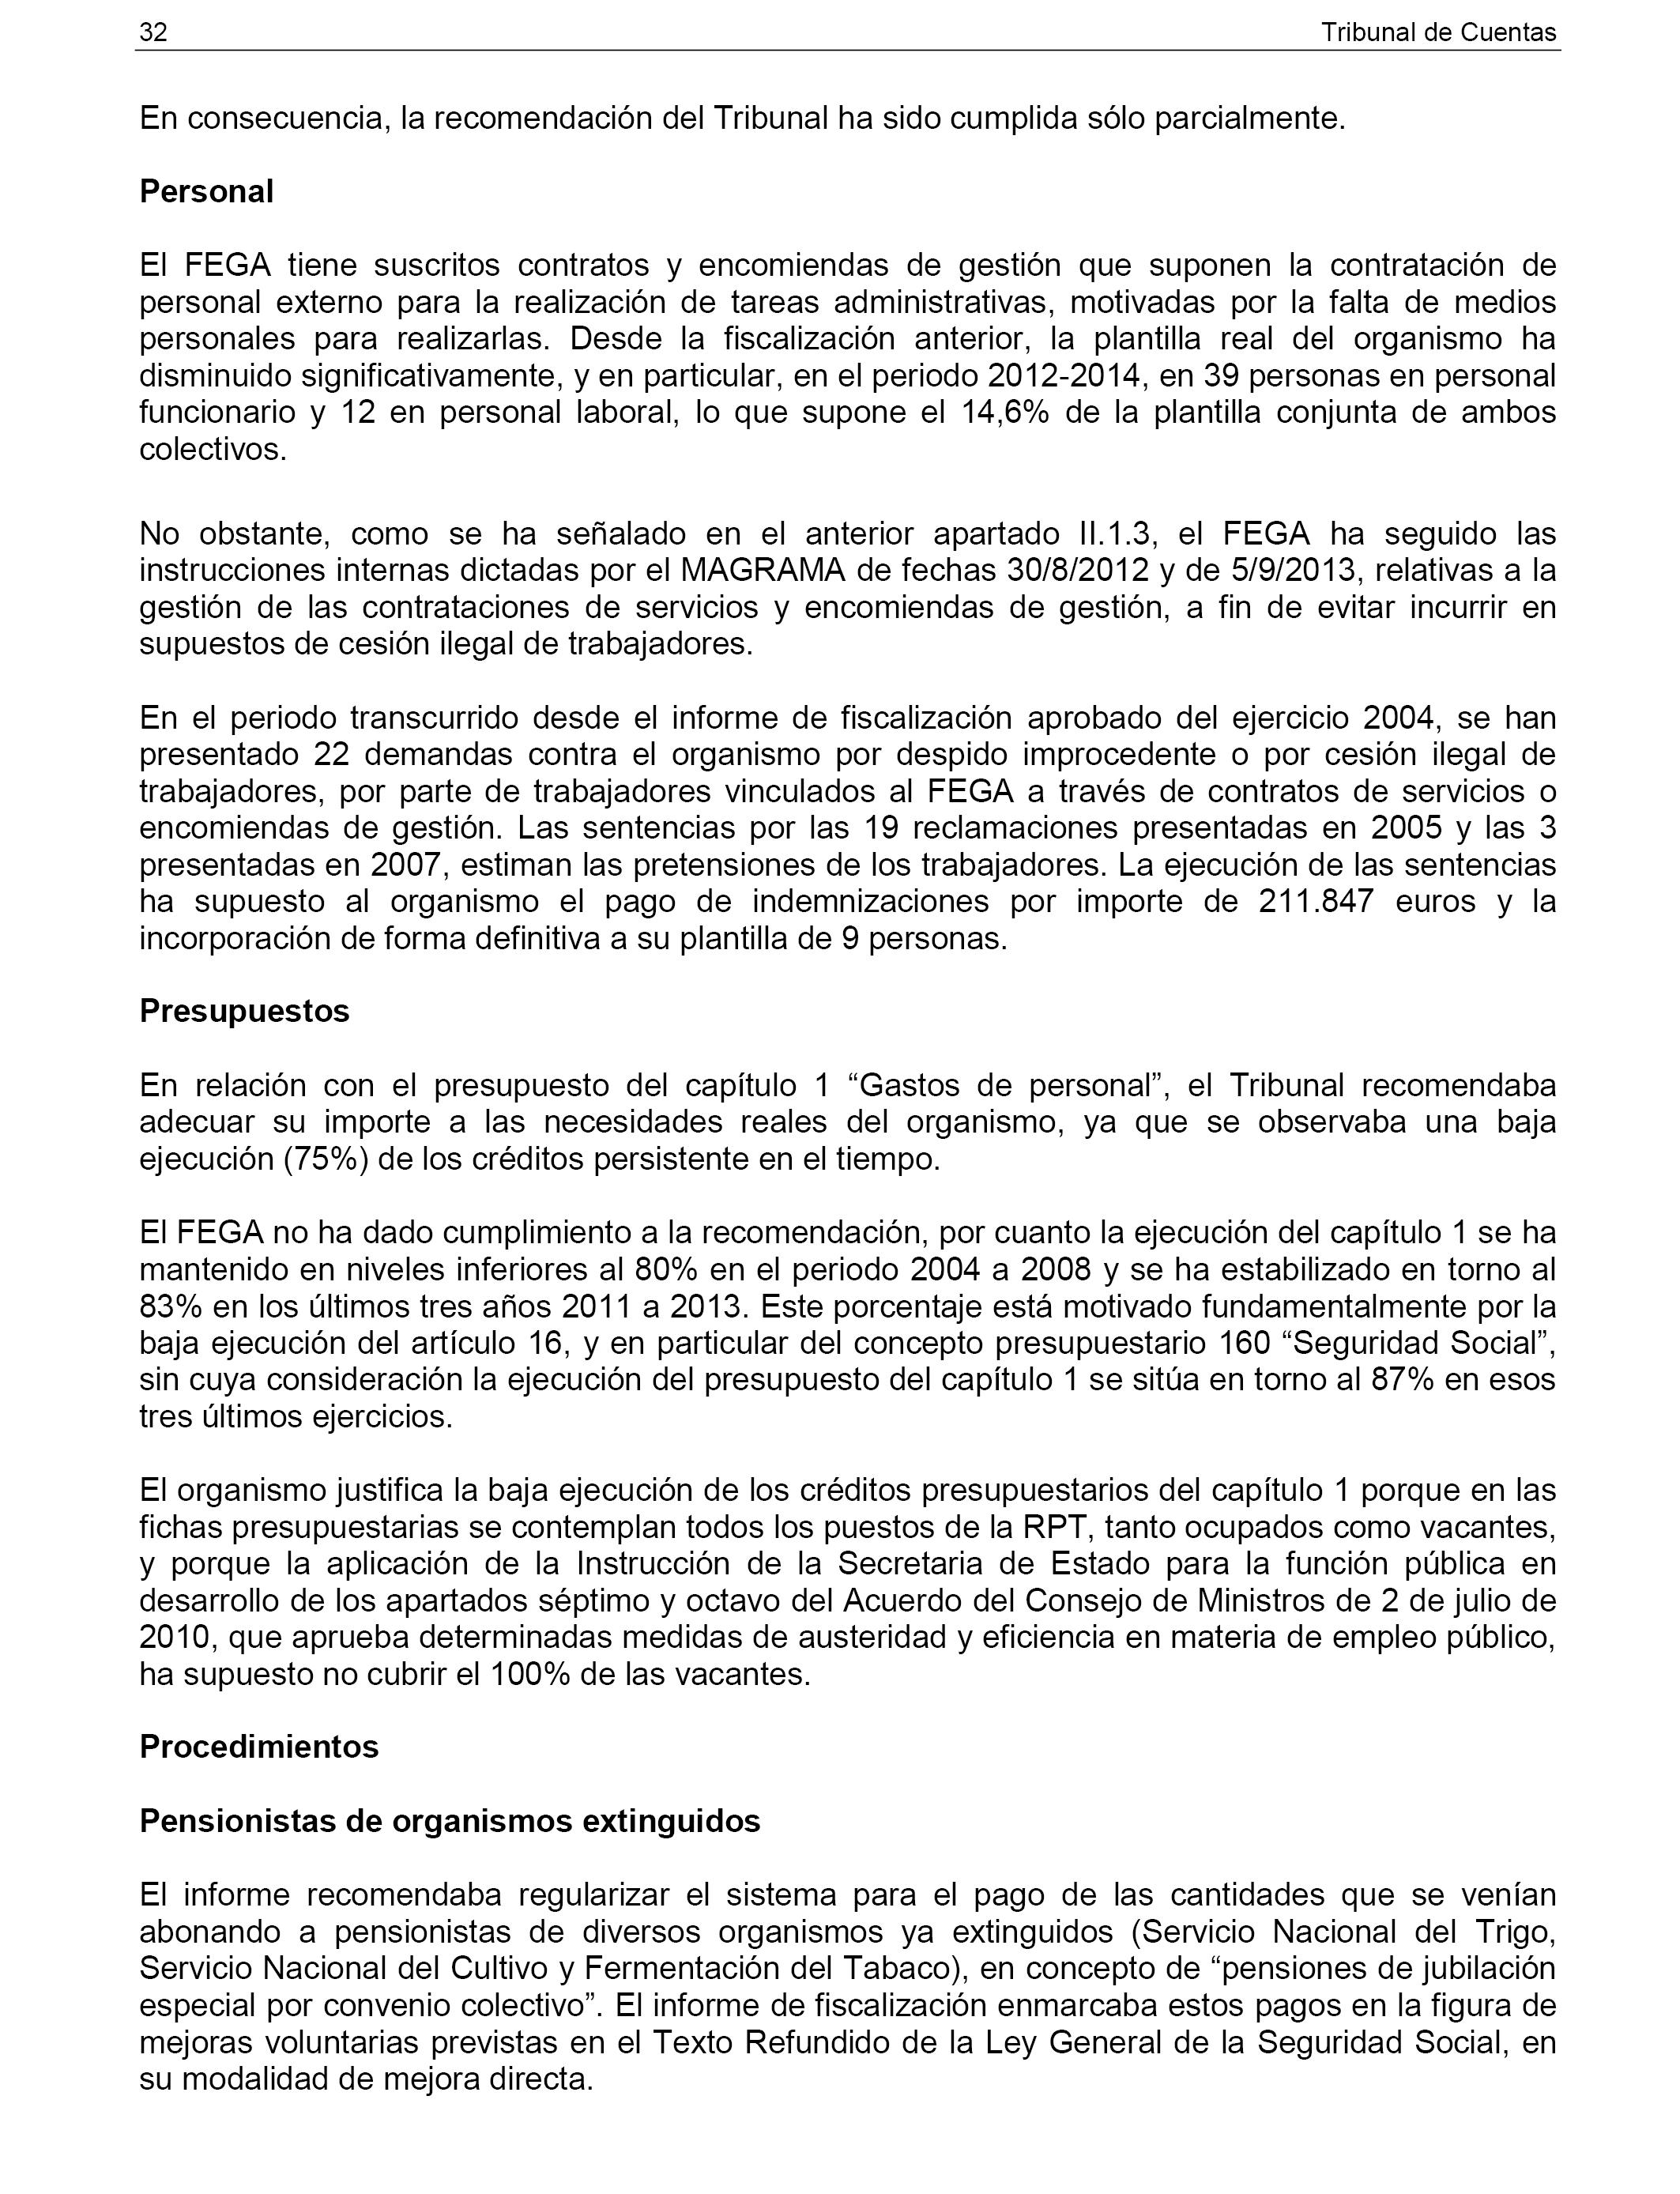 BOE.es - Documento BOE-A-2017-5223